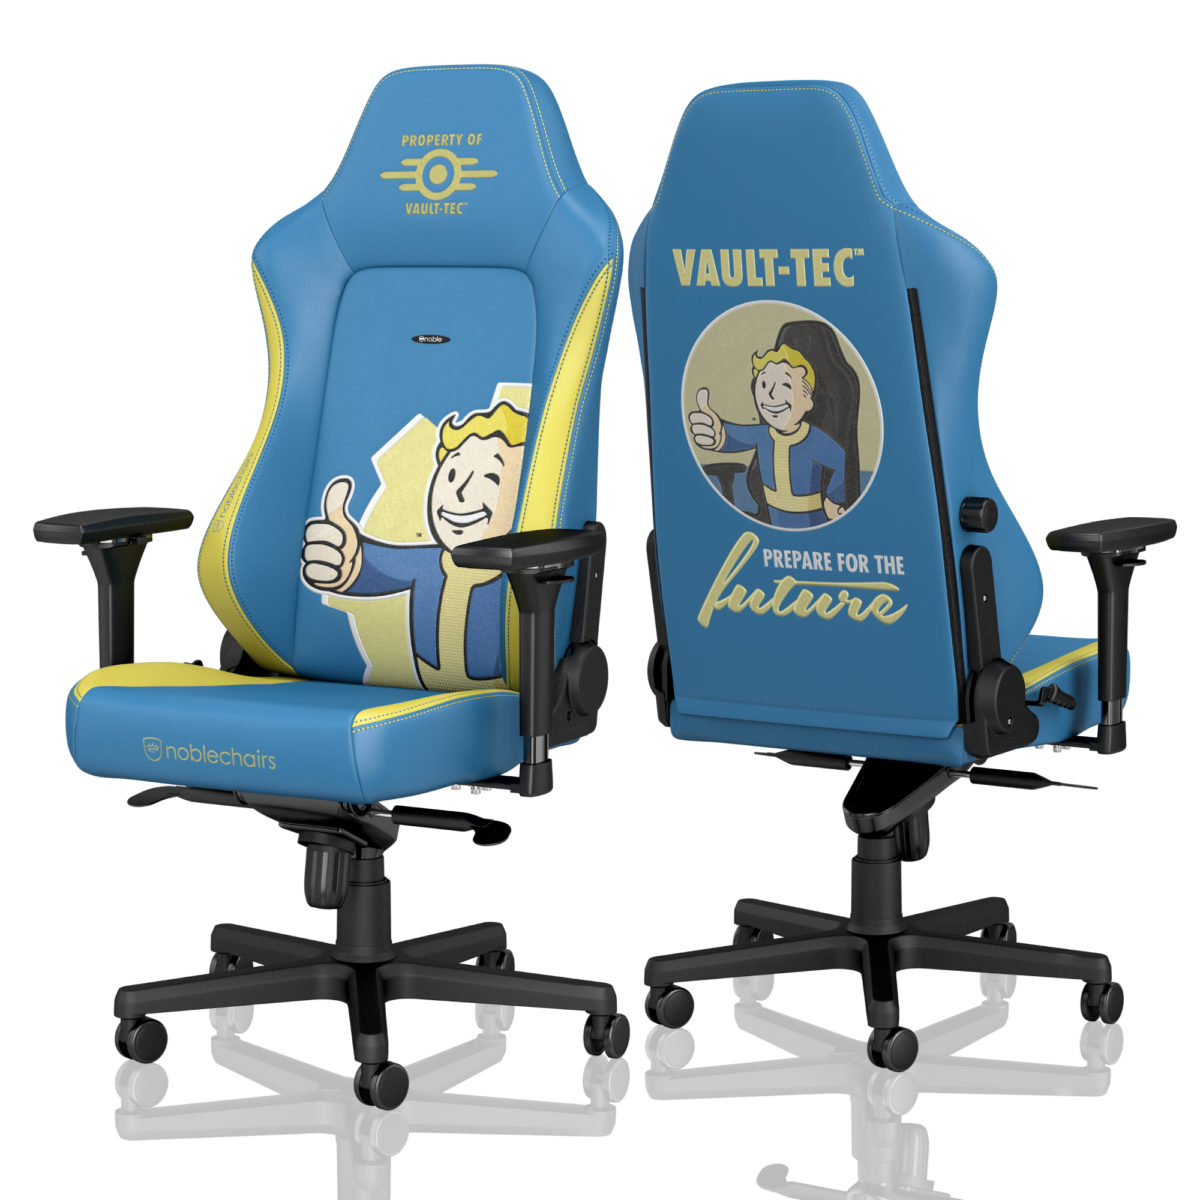 4 9 - 『Fallout』のゲーミングチェアが本日より発売